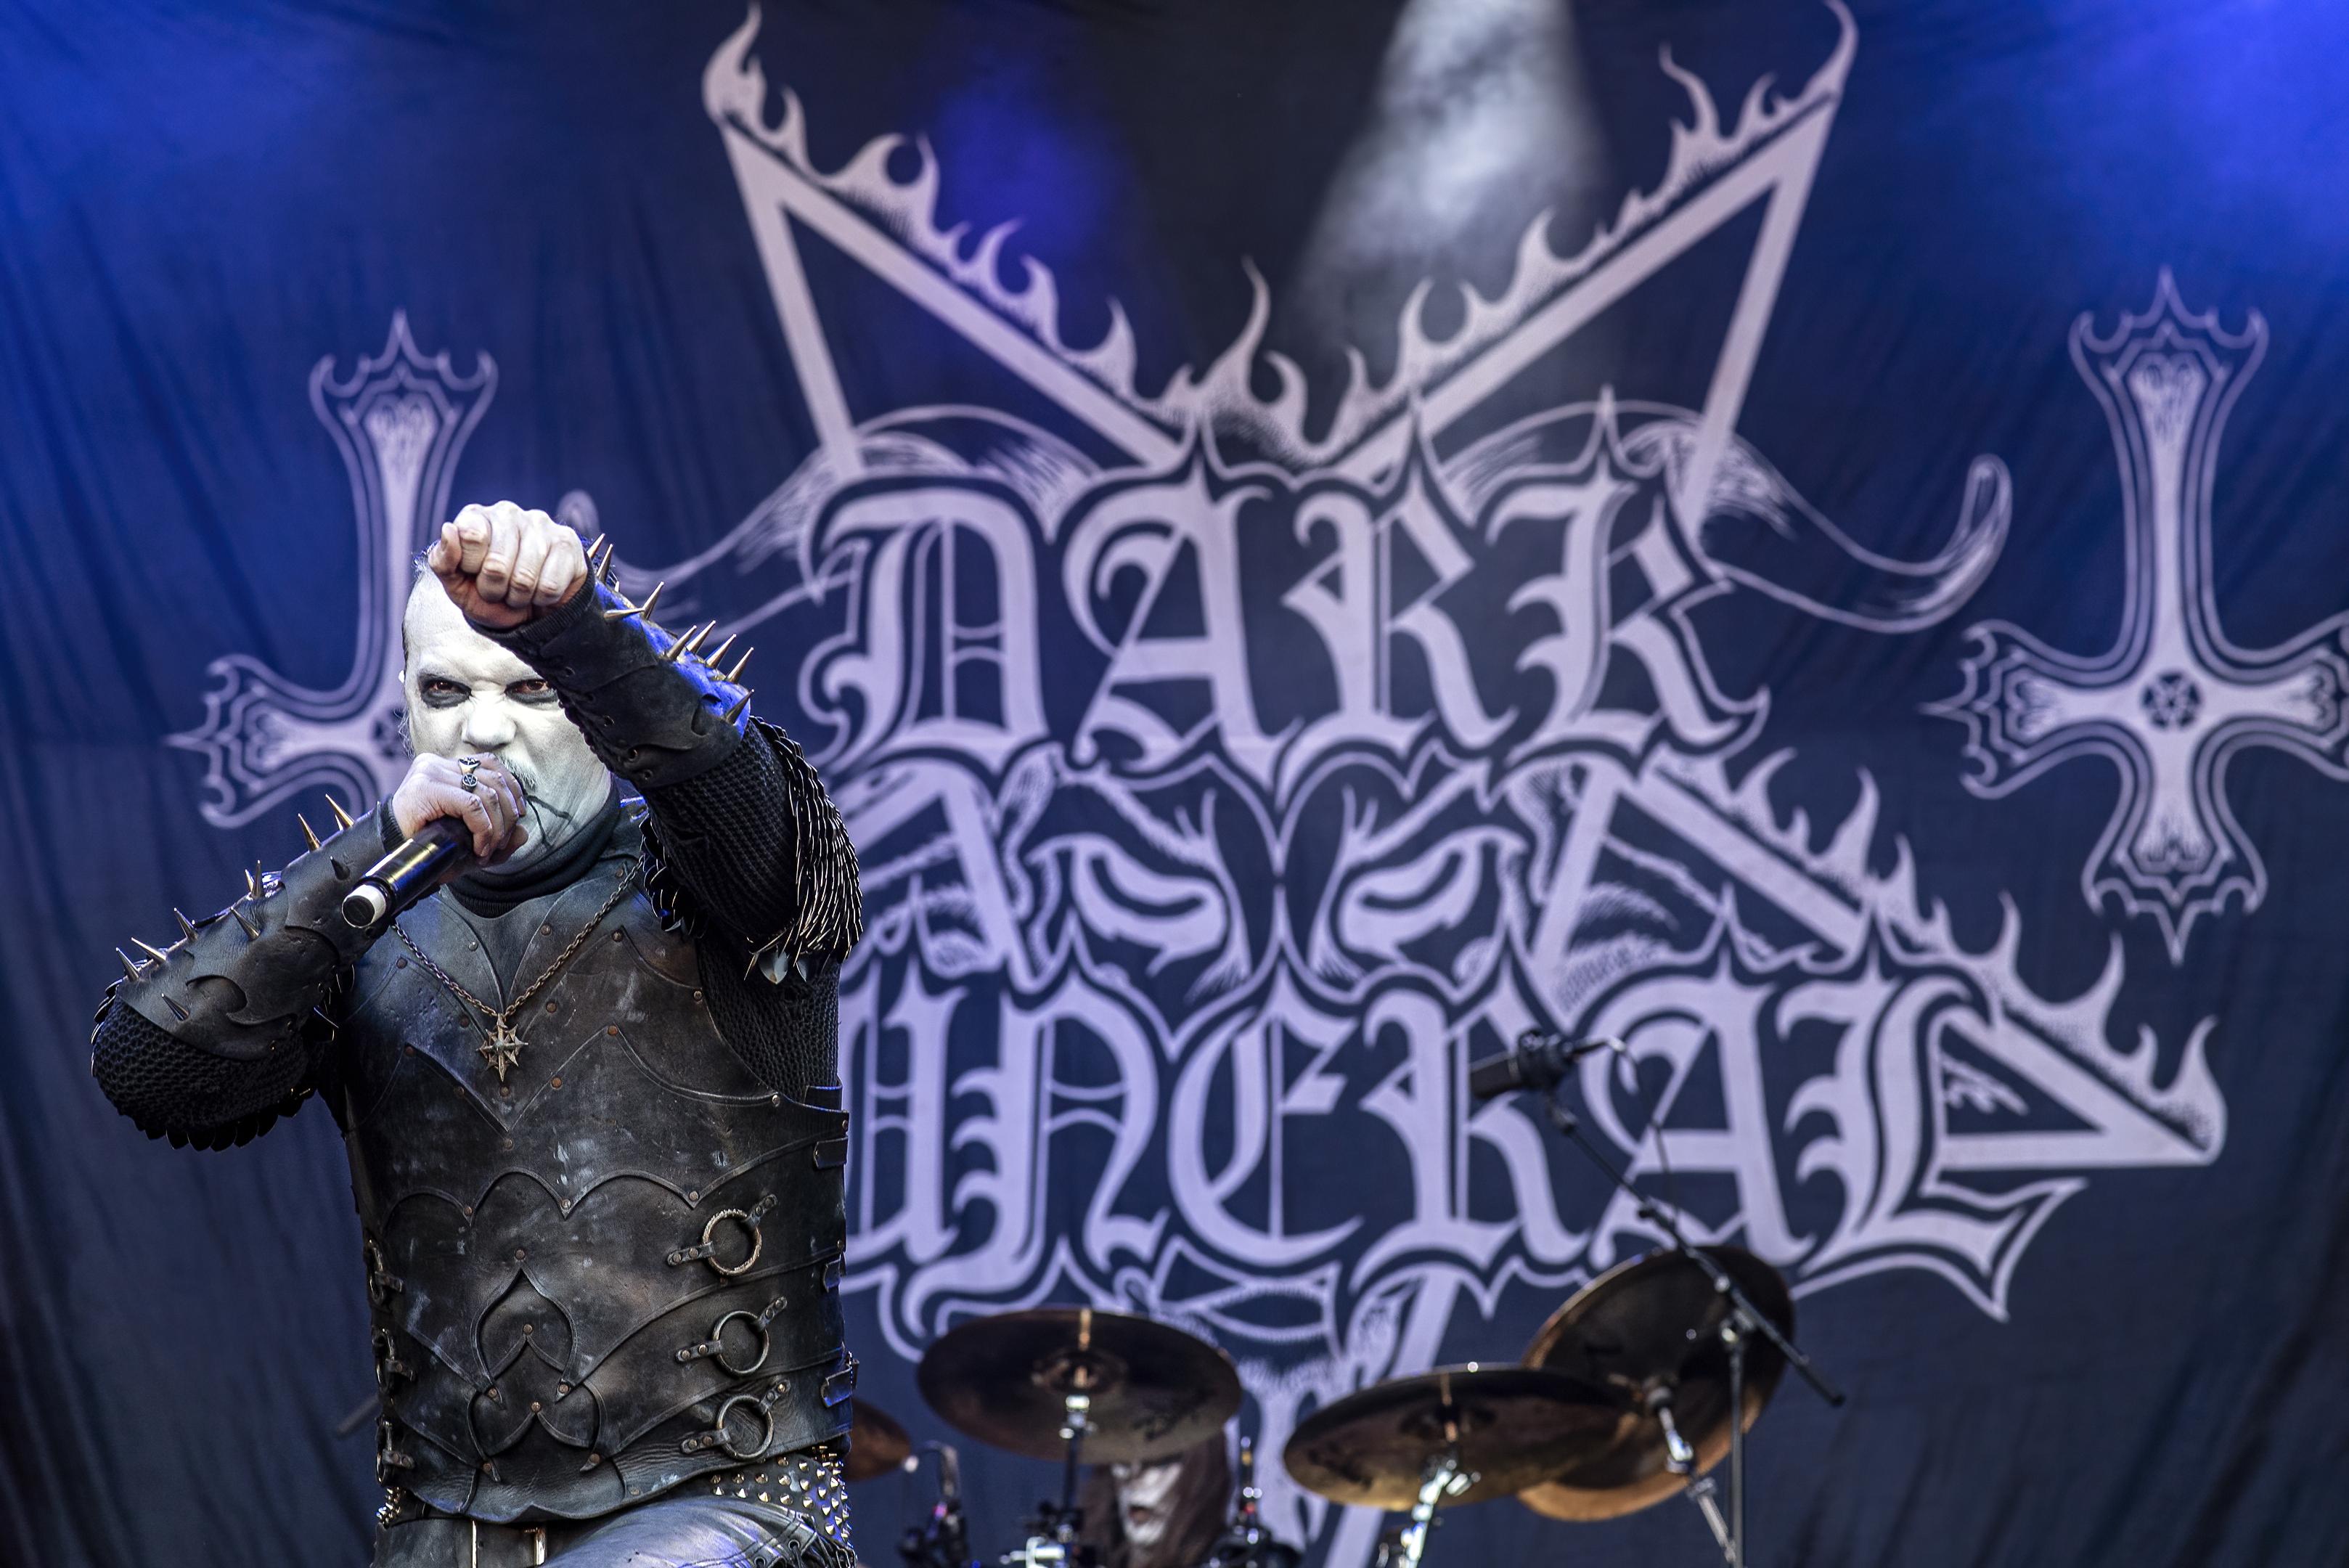 Heljarmadr dark funeral gefle metal festival topaz denoise ai-denoise